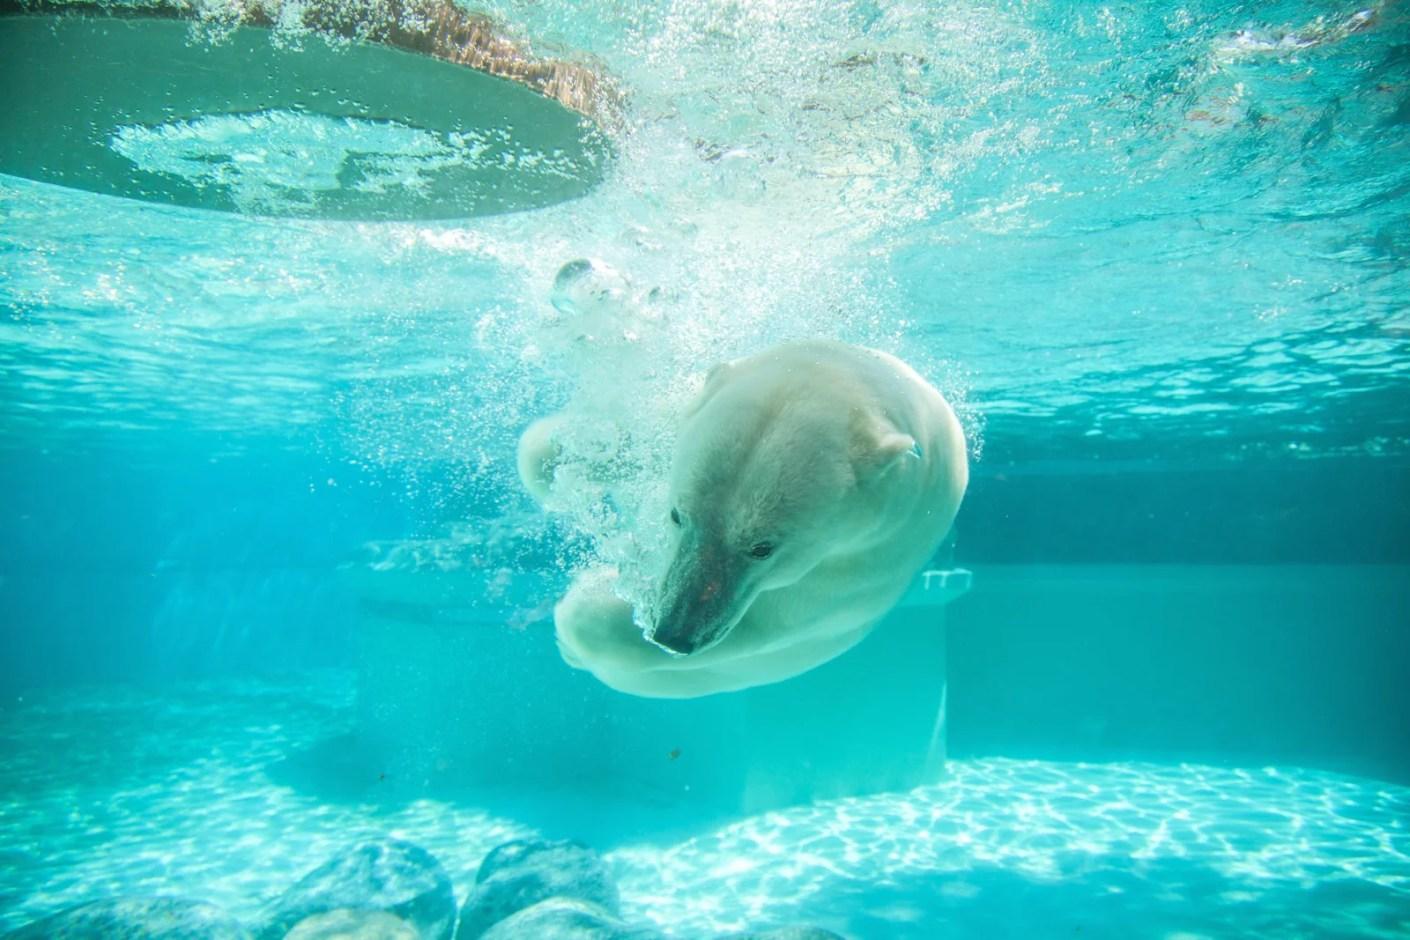 A polar bear at the Lincoln Park Zoo! (Photo by Matthew Mazzei / Unsplash)